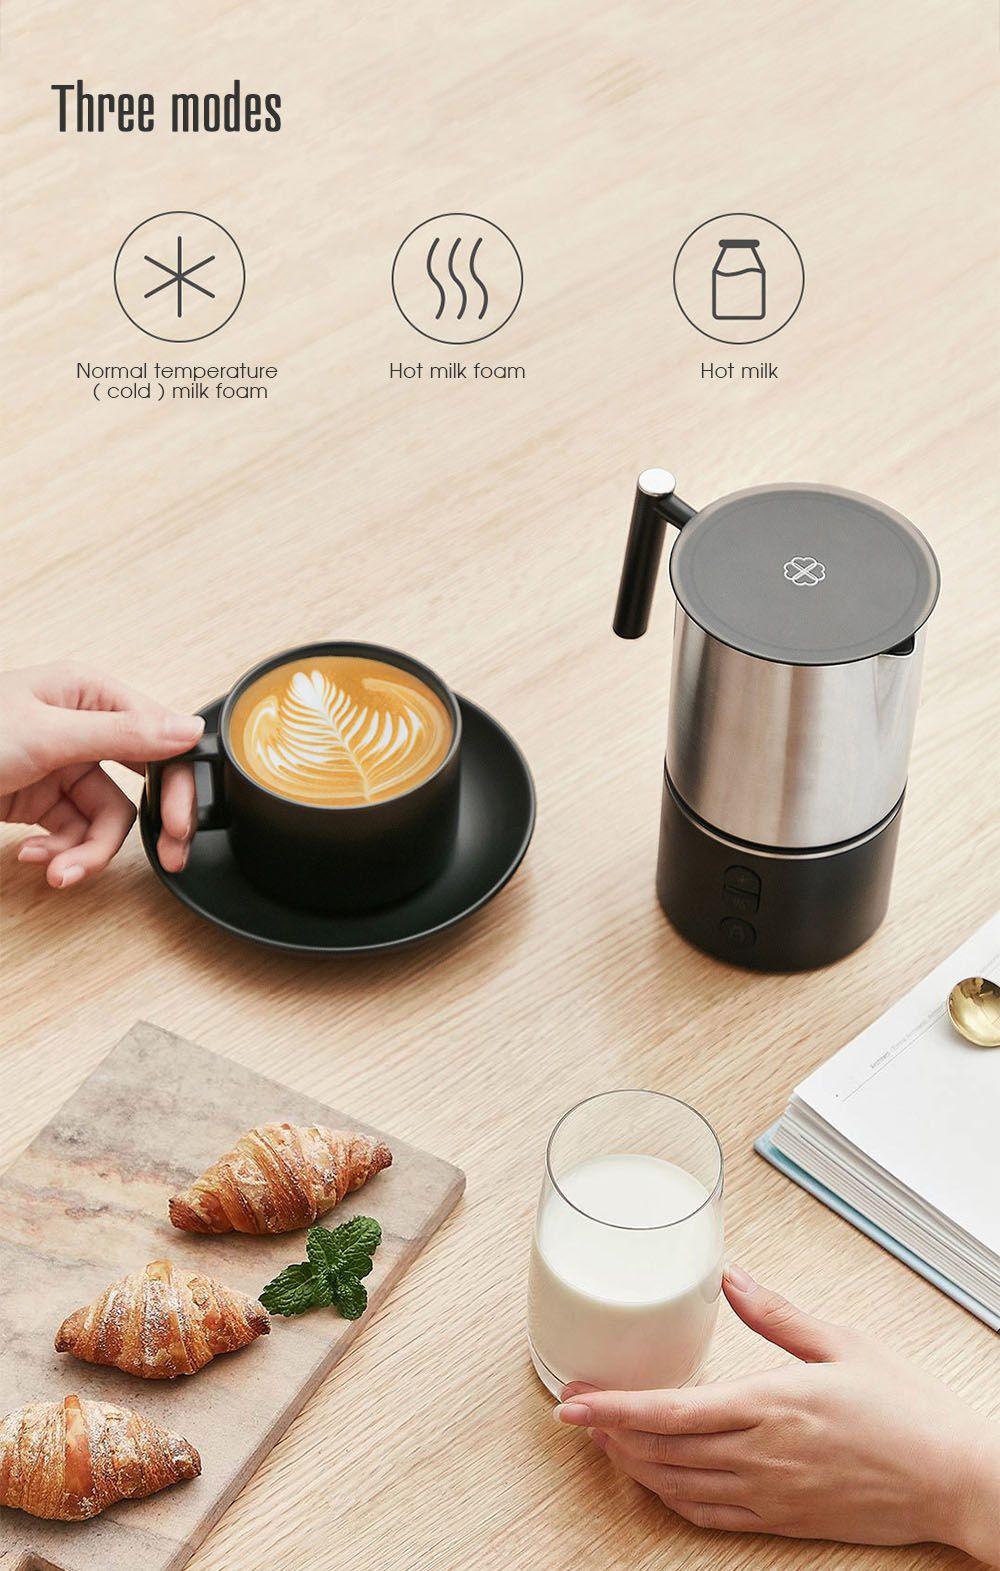 Xiaomi Scishare S3101 Electric Milk Frothing Machine Diy Coffee (3)